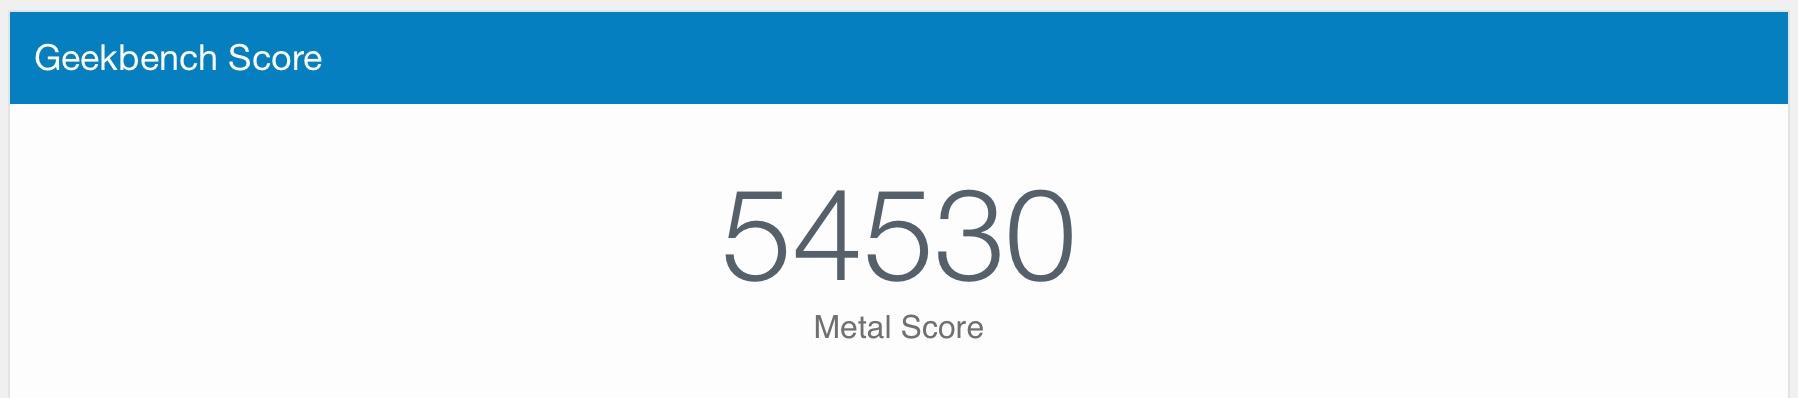 gb4.1_metal.jpeg